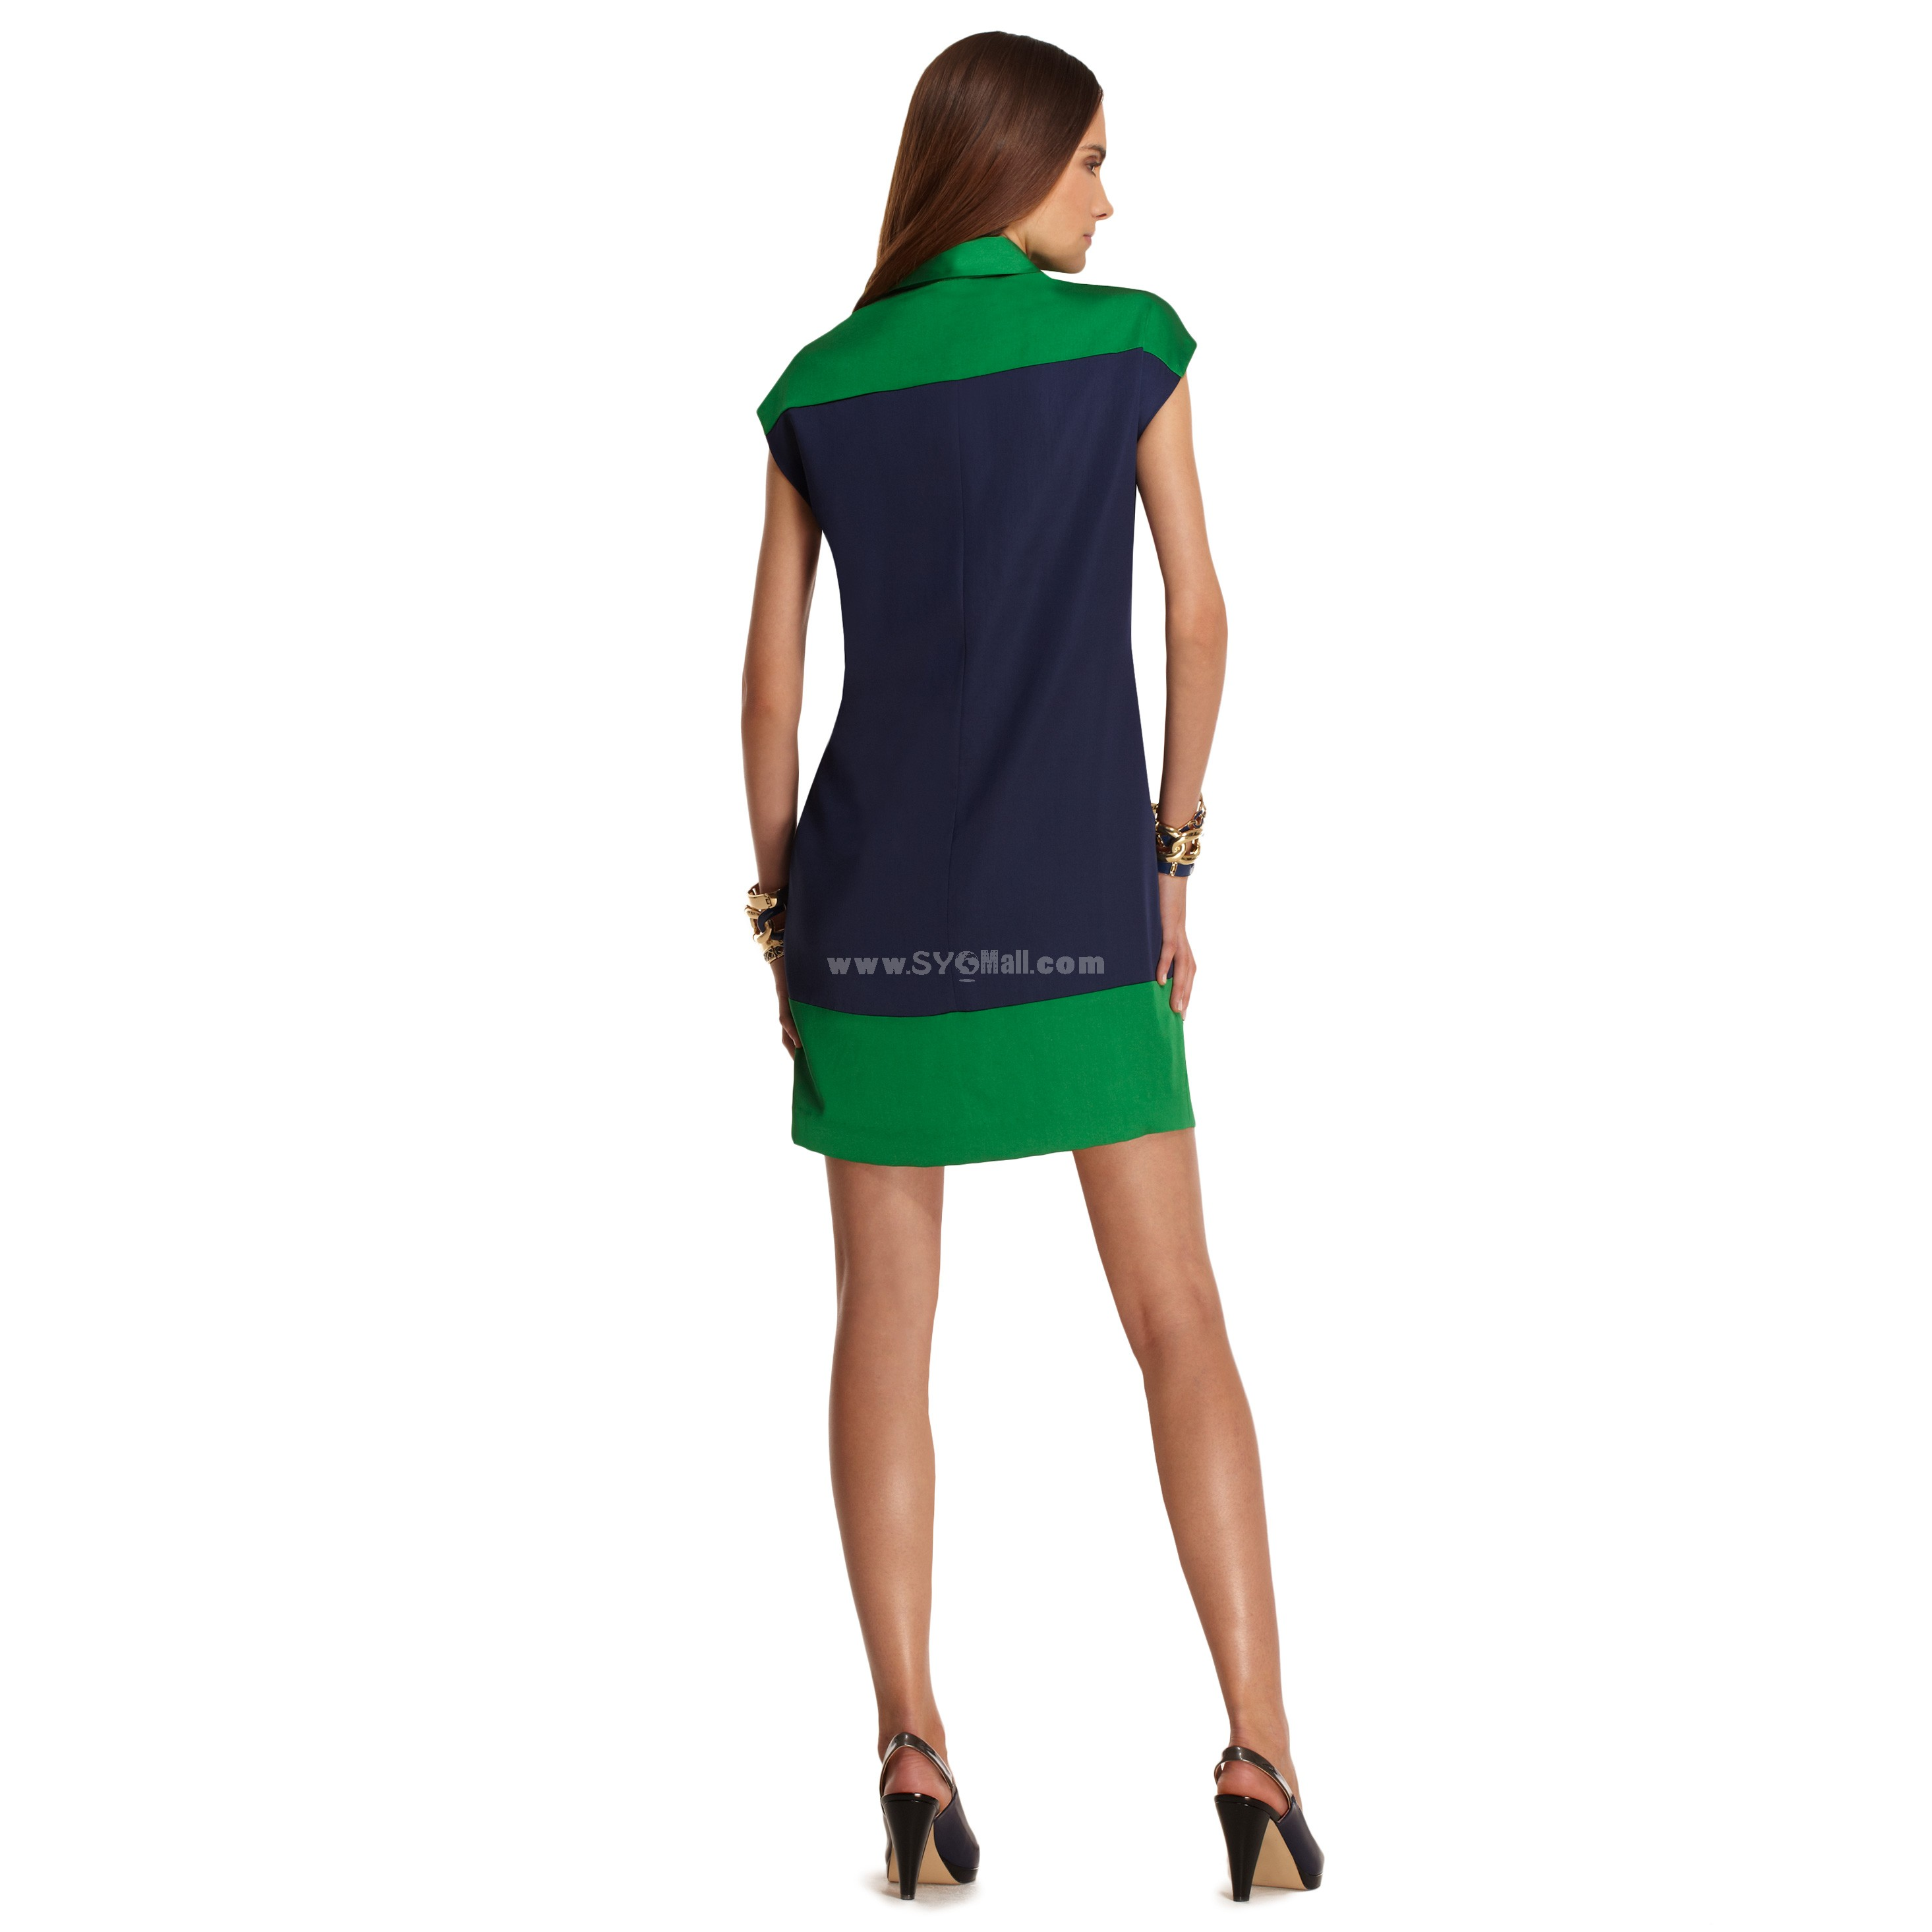 Plain Collar Color Contrast Short Sleeve Dress Evening Dress